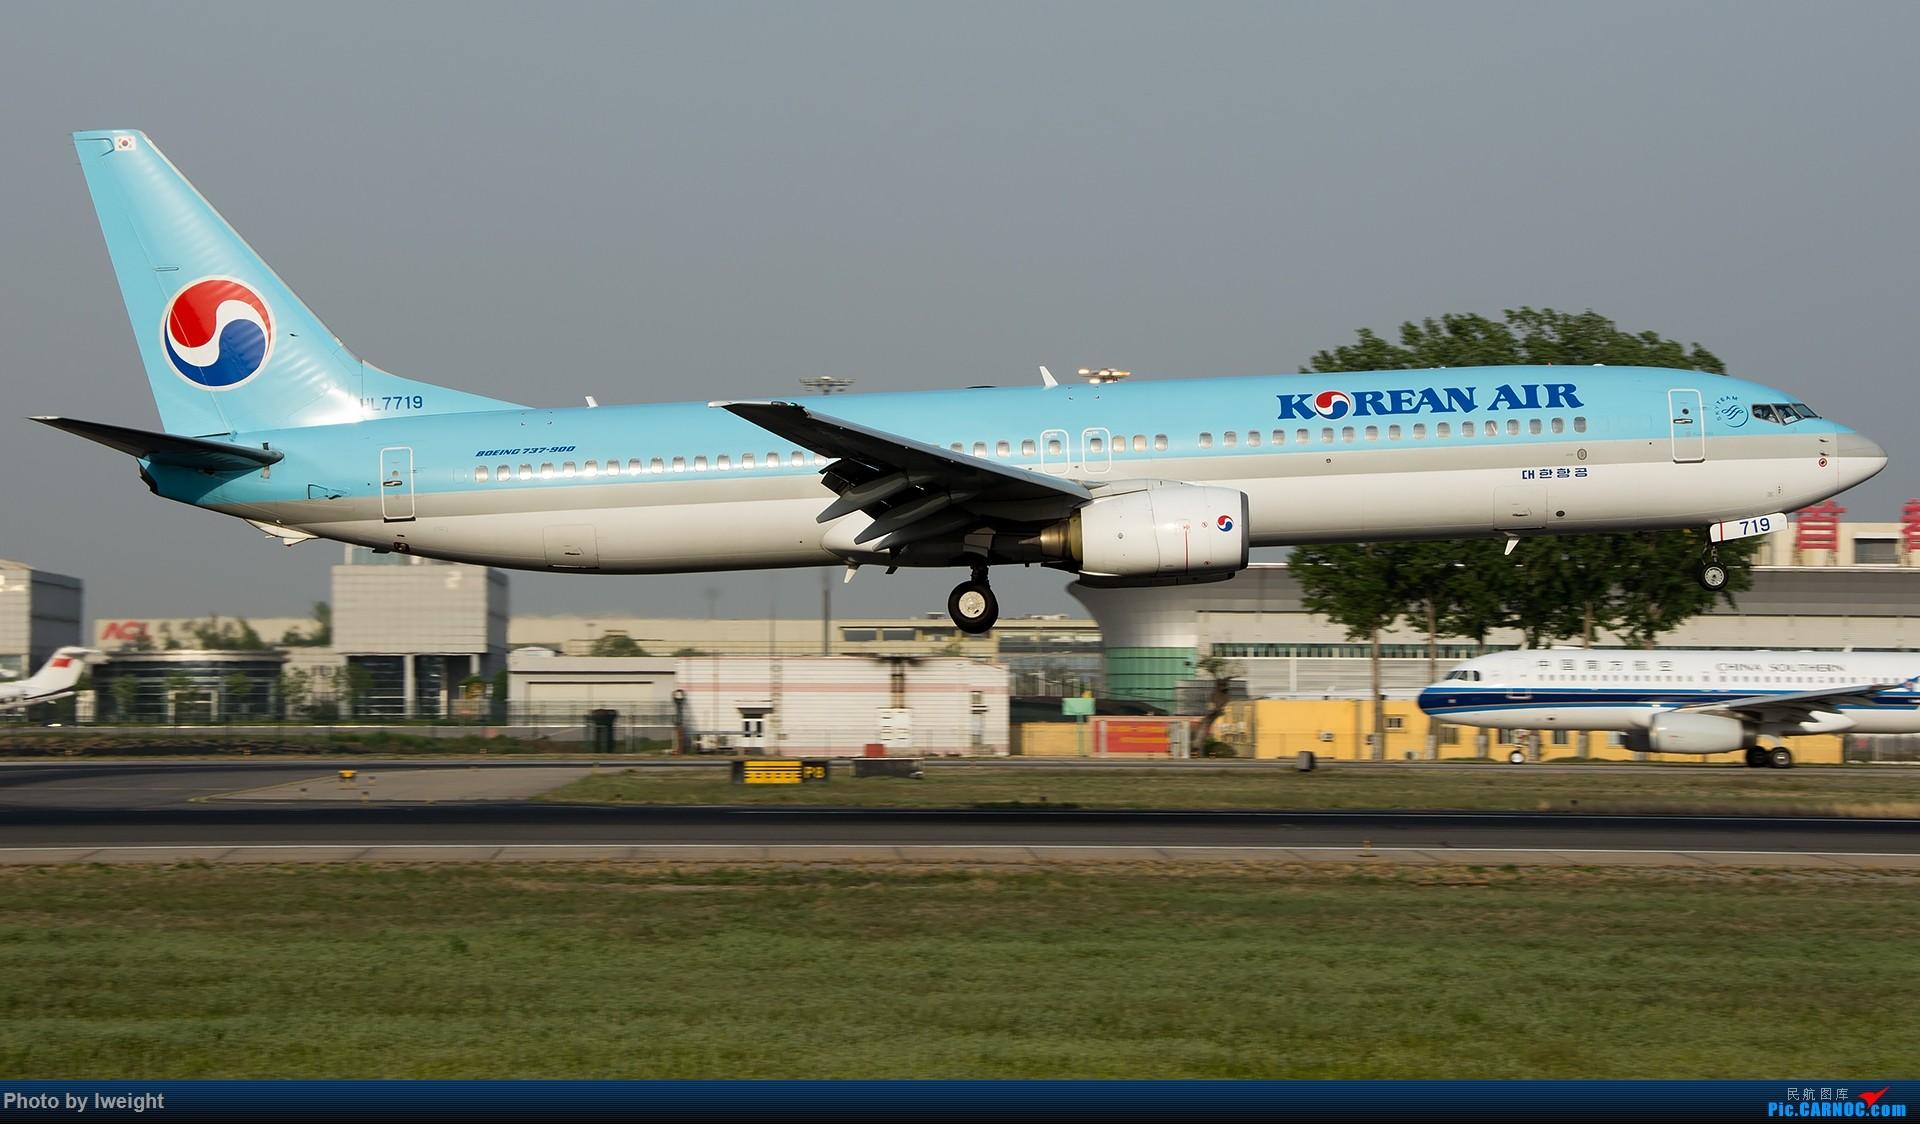 Re:[原创]天气晴朗,继续守候18R【多图】 BOEING 737-900 HL7719 中国北京首都国际机场